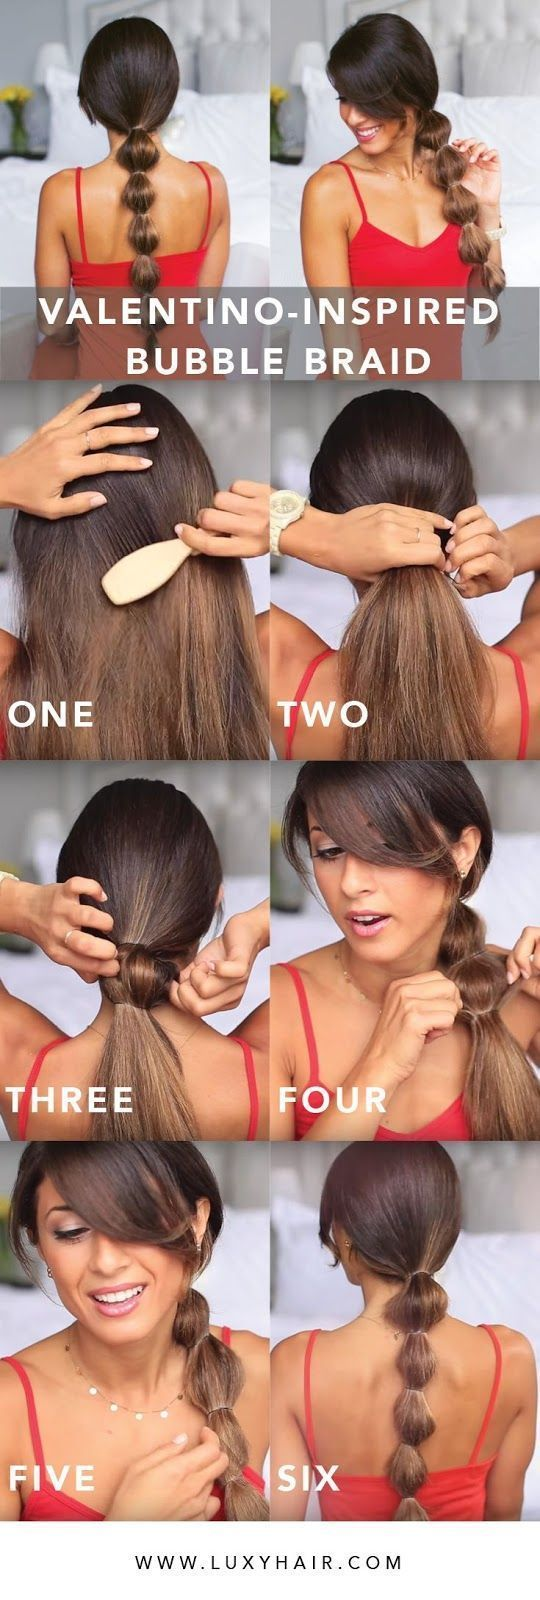 Bubble braids! Photos and Video tutorials! #bubble Braids tutorial #bubble Braids tutorial